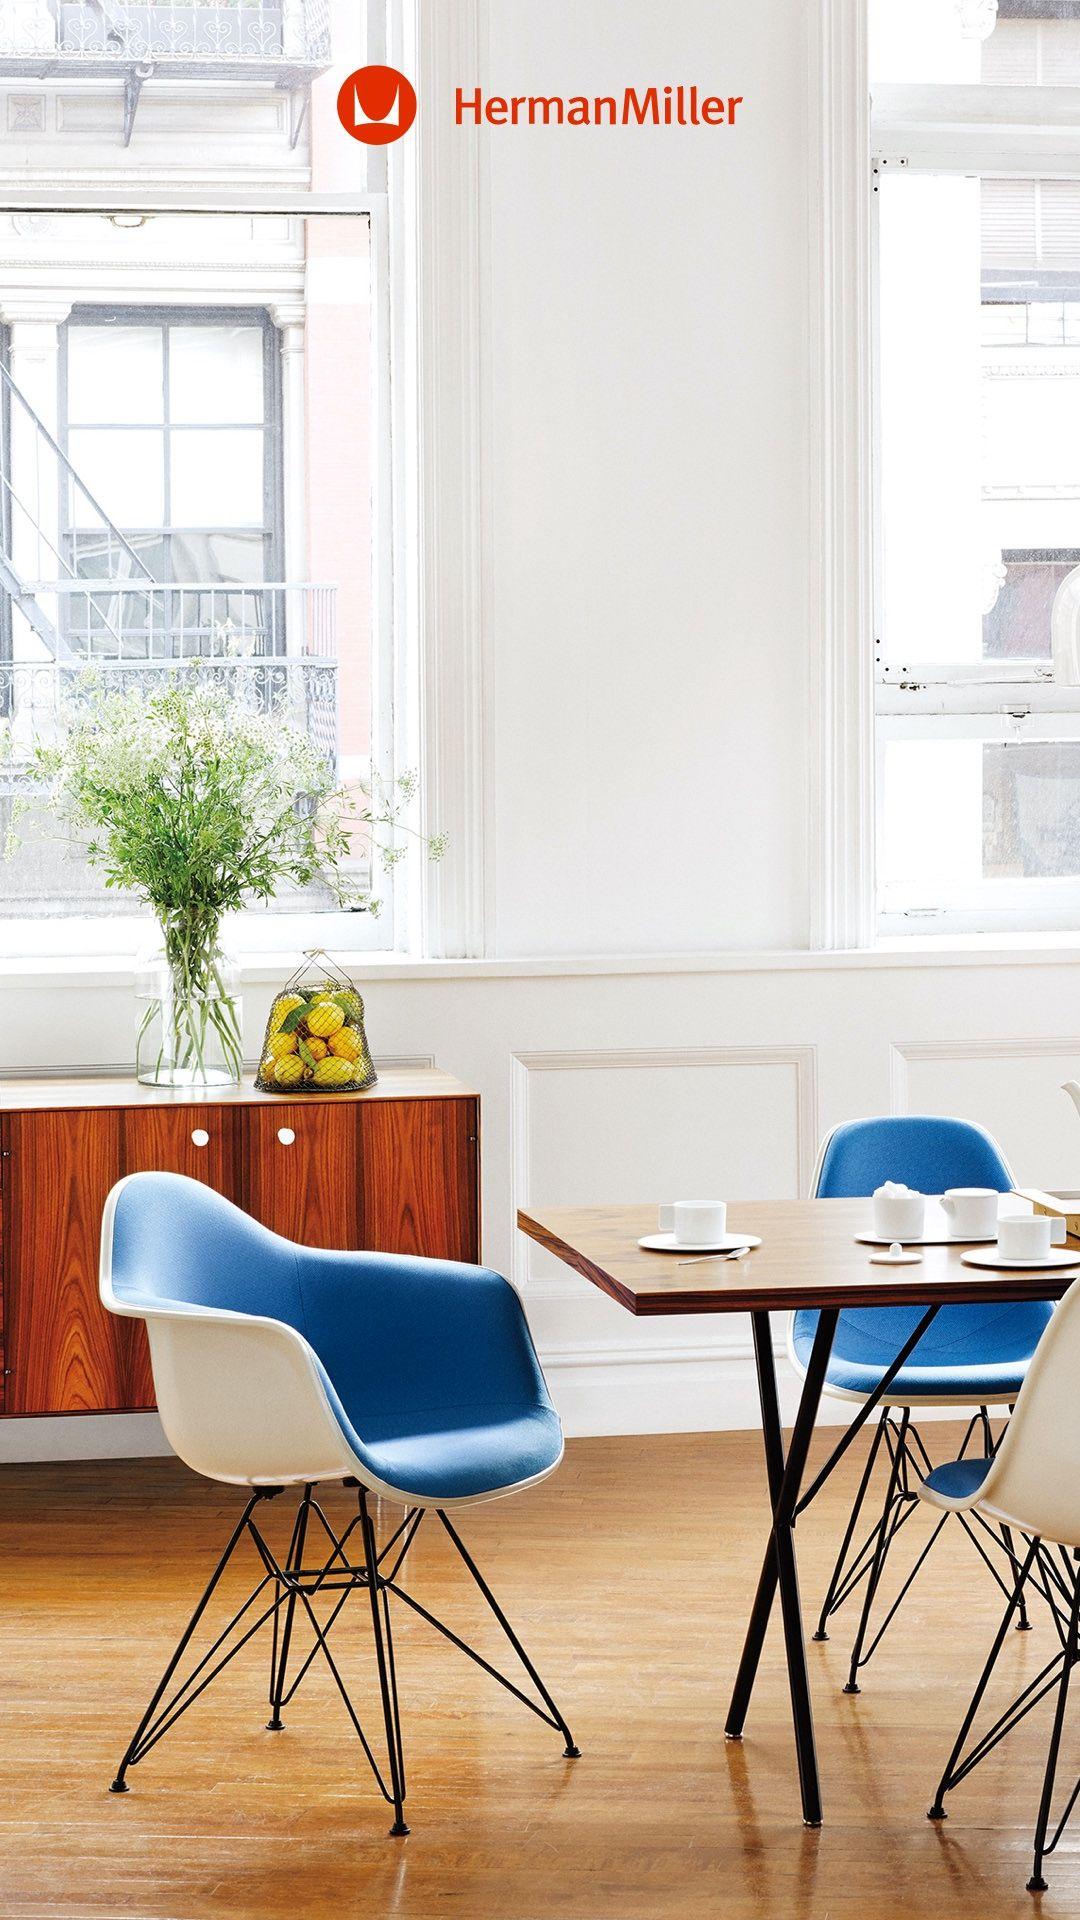 Table Herman Miller Eames Dining, Herman Miller Dining Room Chairs